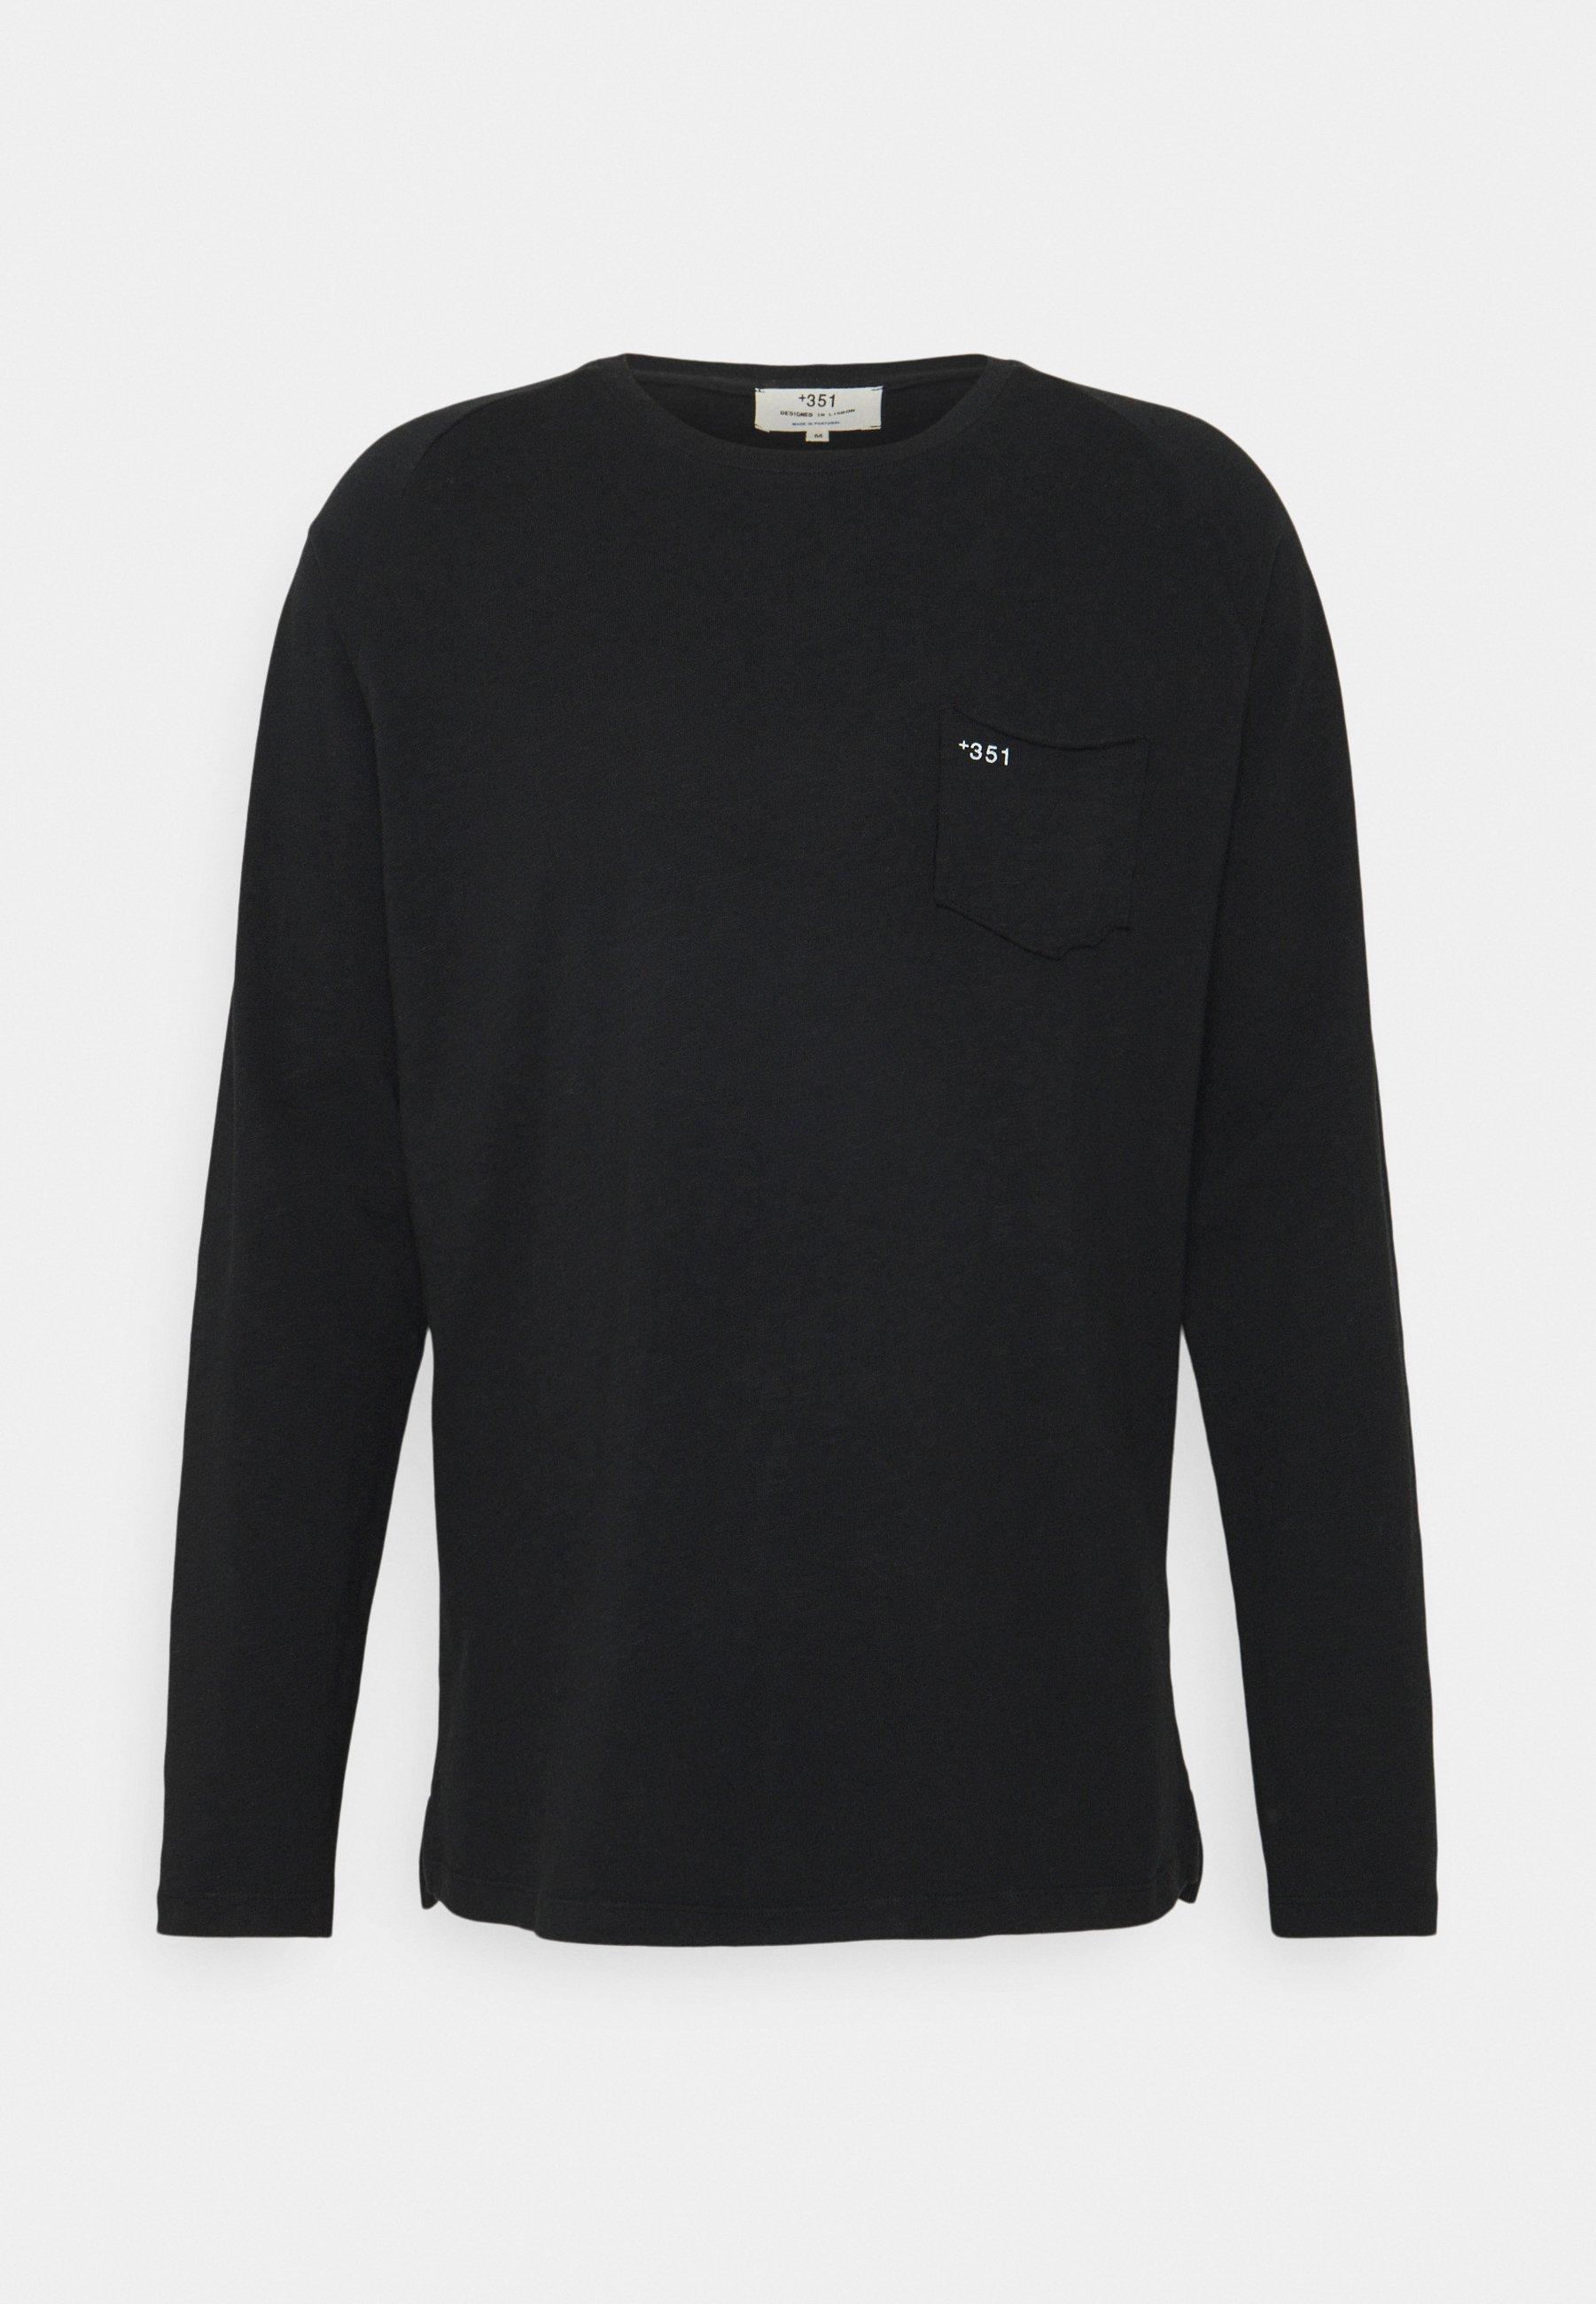 Uomo LONG SLEEVE ESSENTIAL UNISEX - Maglietta a manica lunga